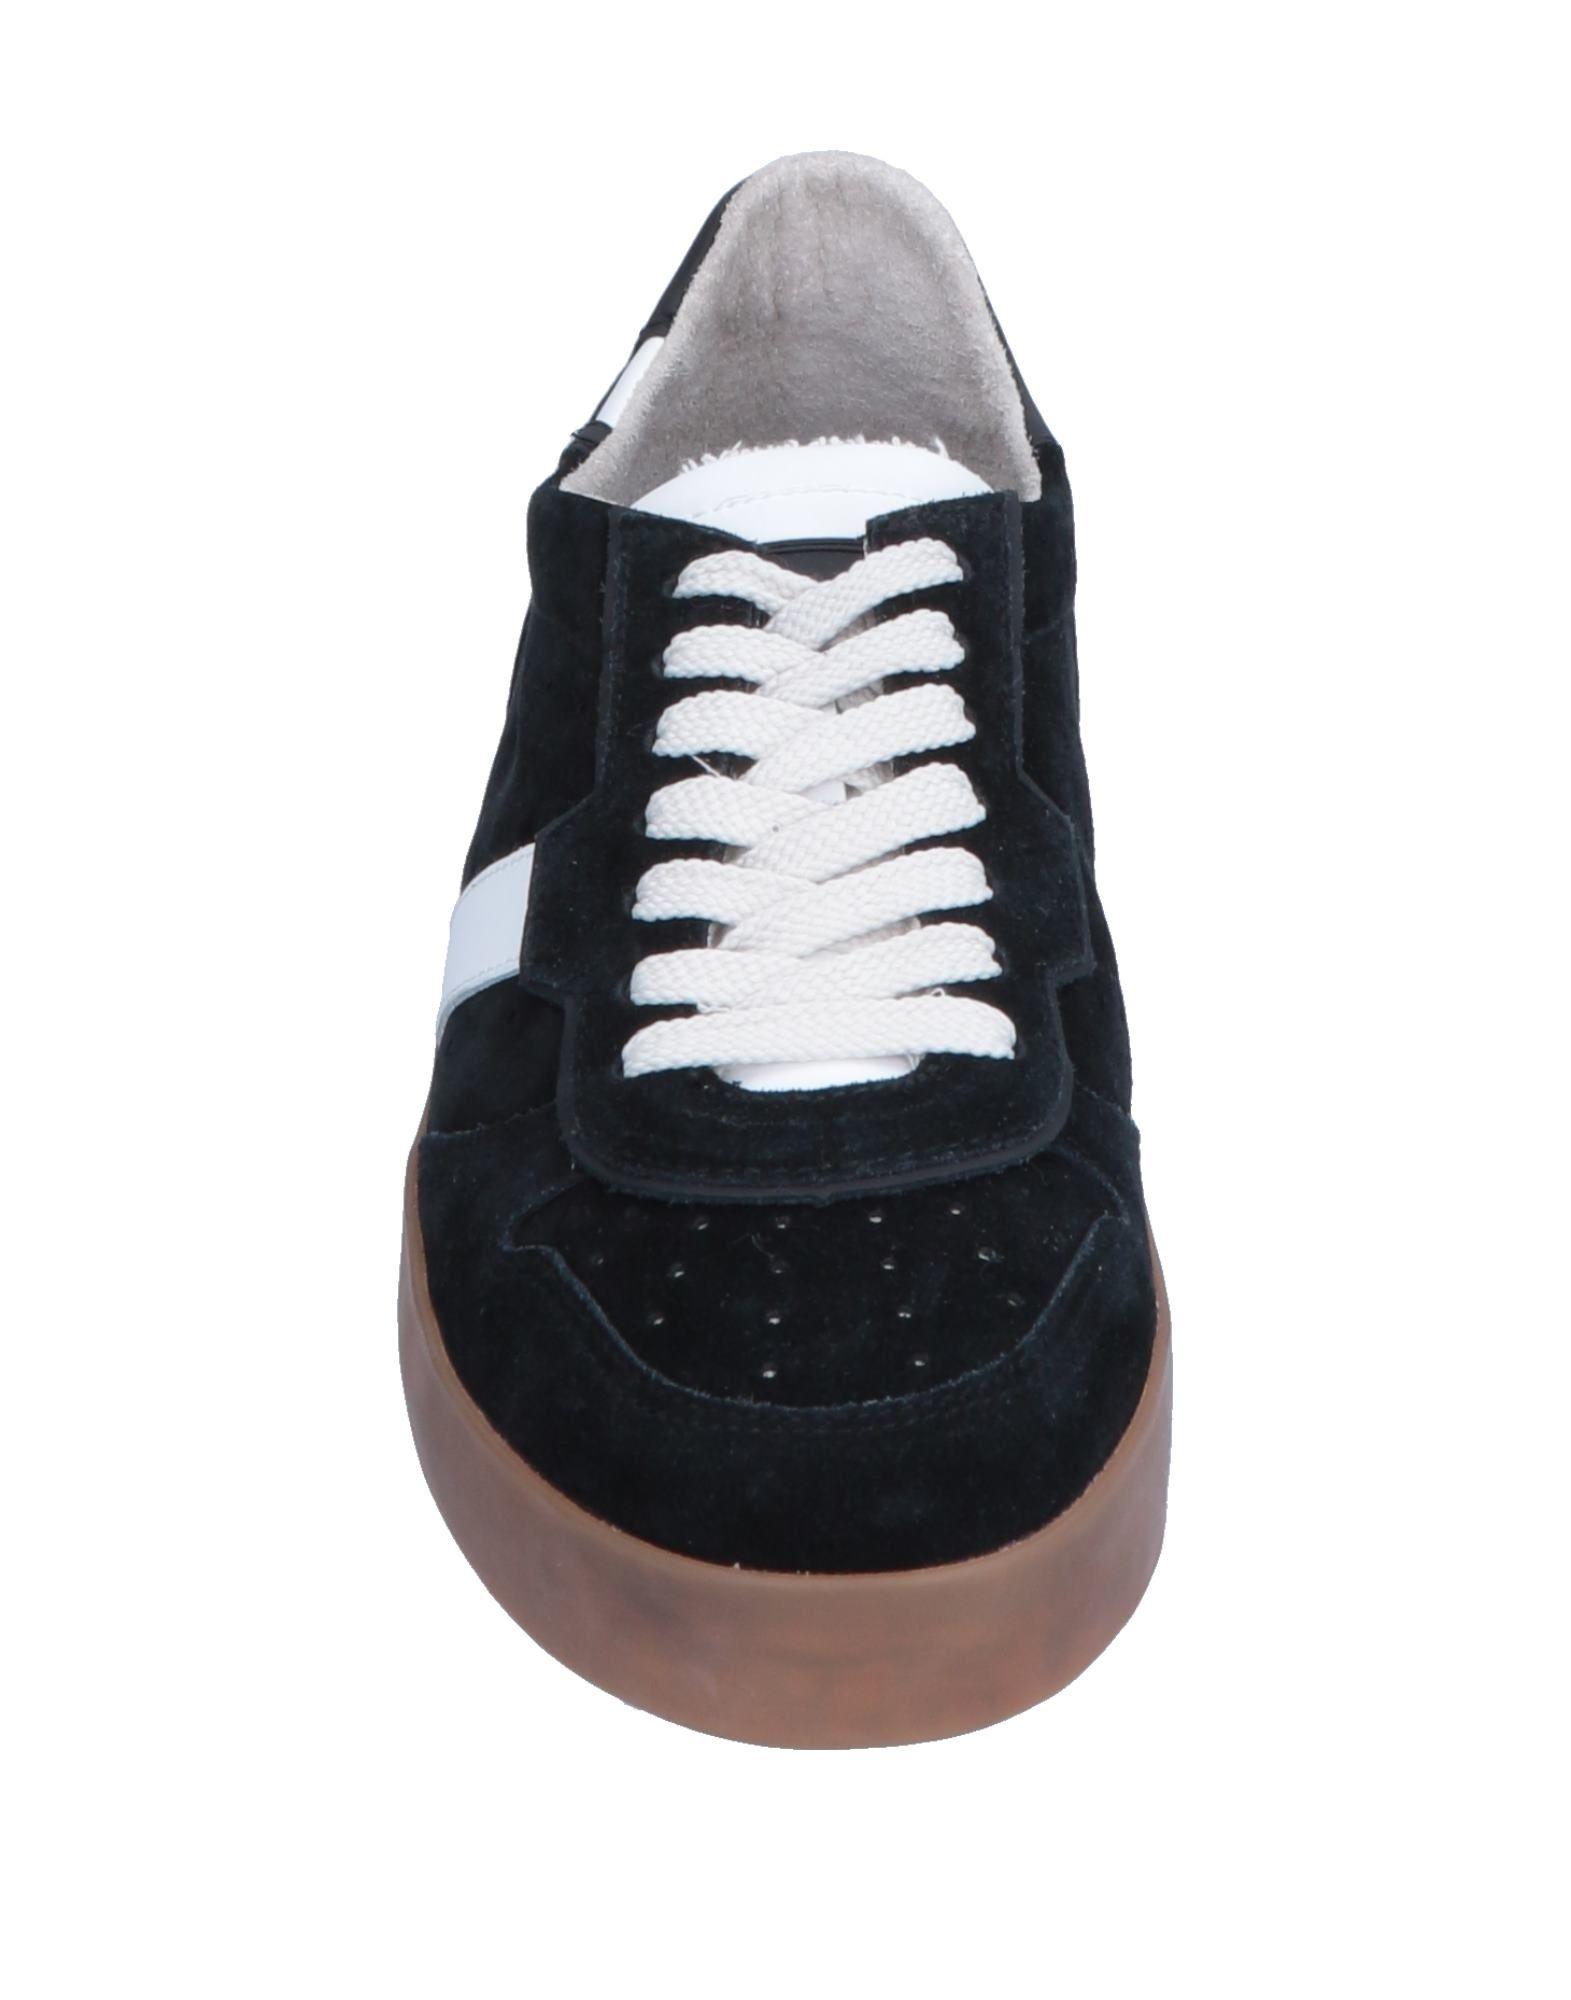 Rabatt Herren echte Schuhe D.A.T.E. Sneakers Herren Rabatt  11556773KE feab3c